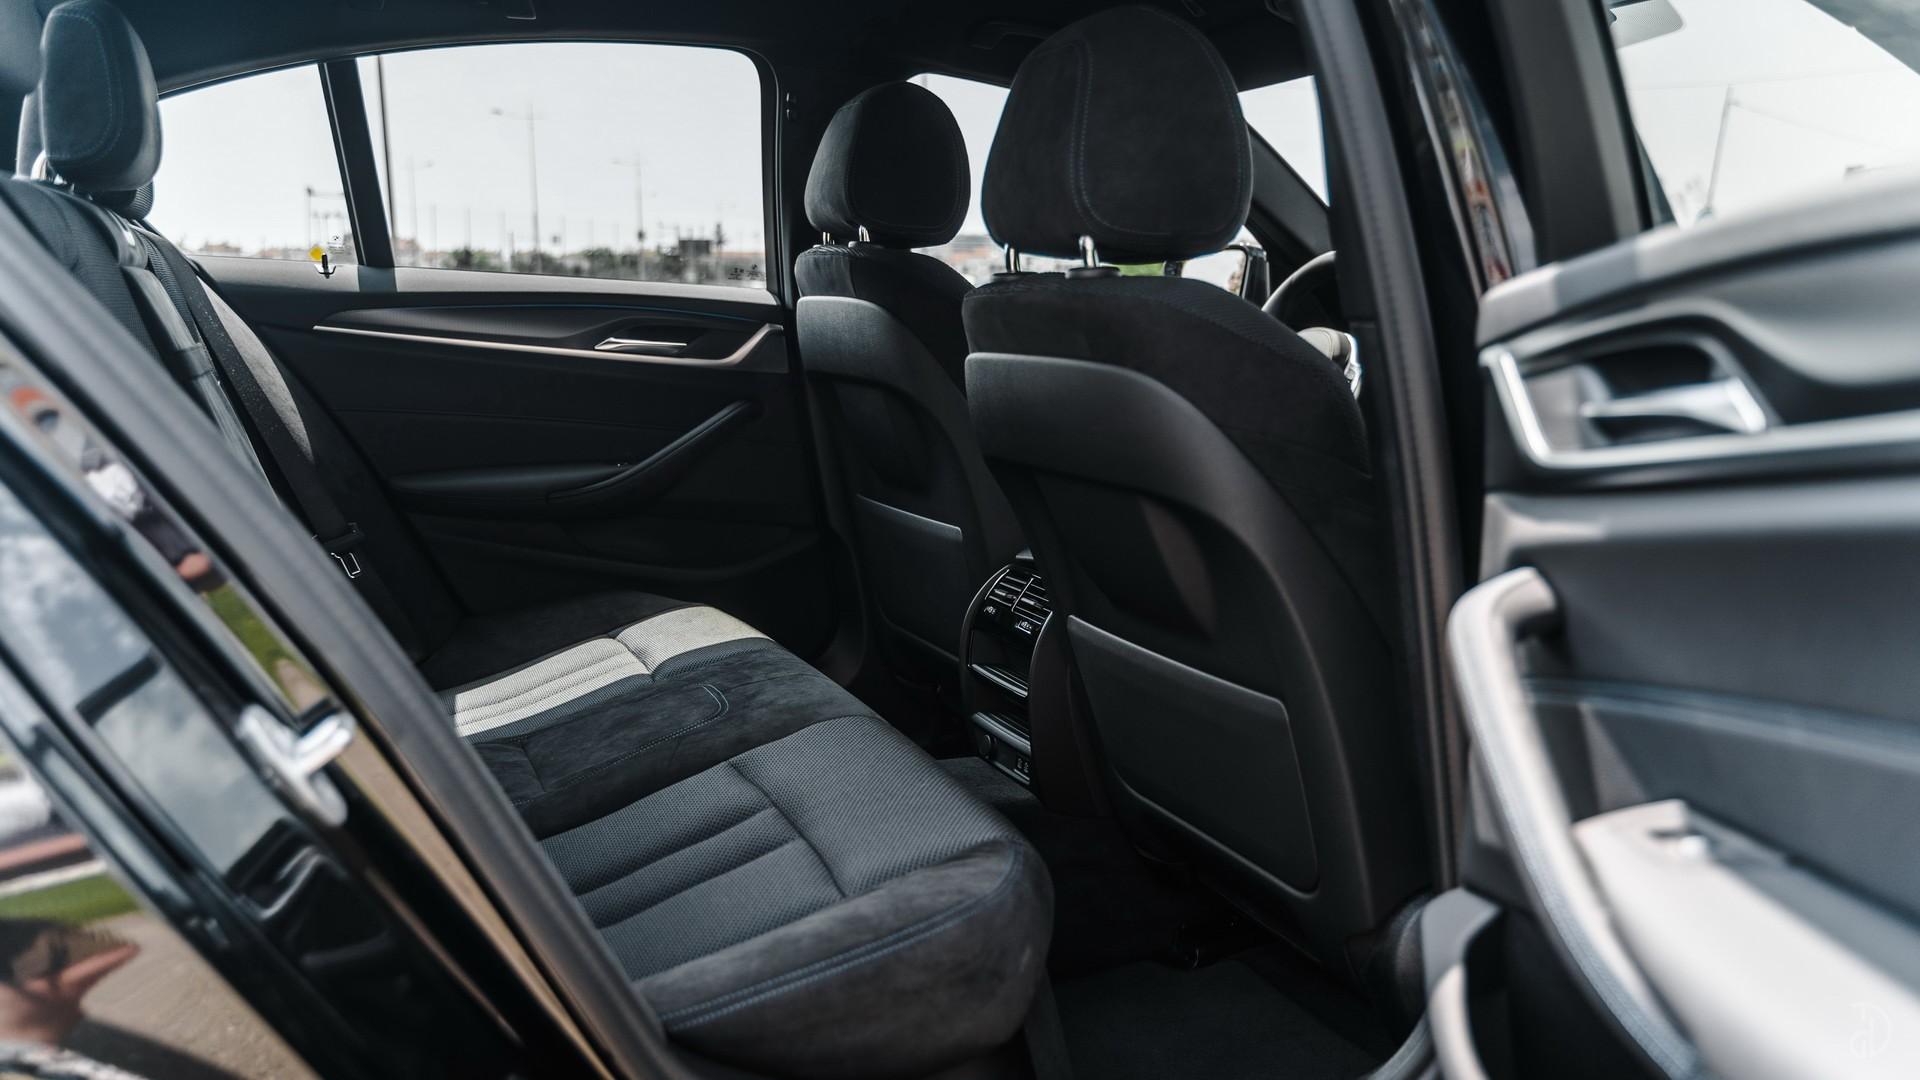 Аренда BMW 520d G30 в Сочи. Фото 10